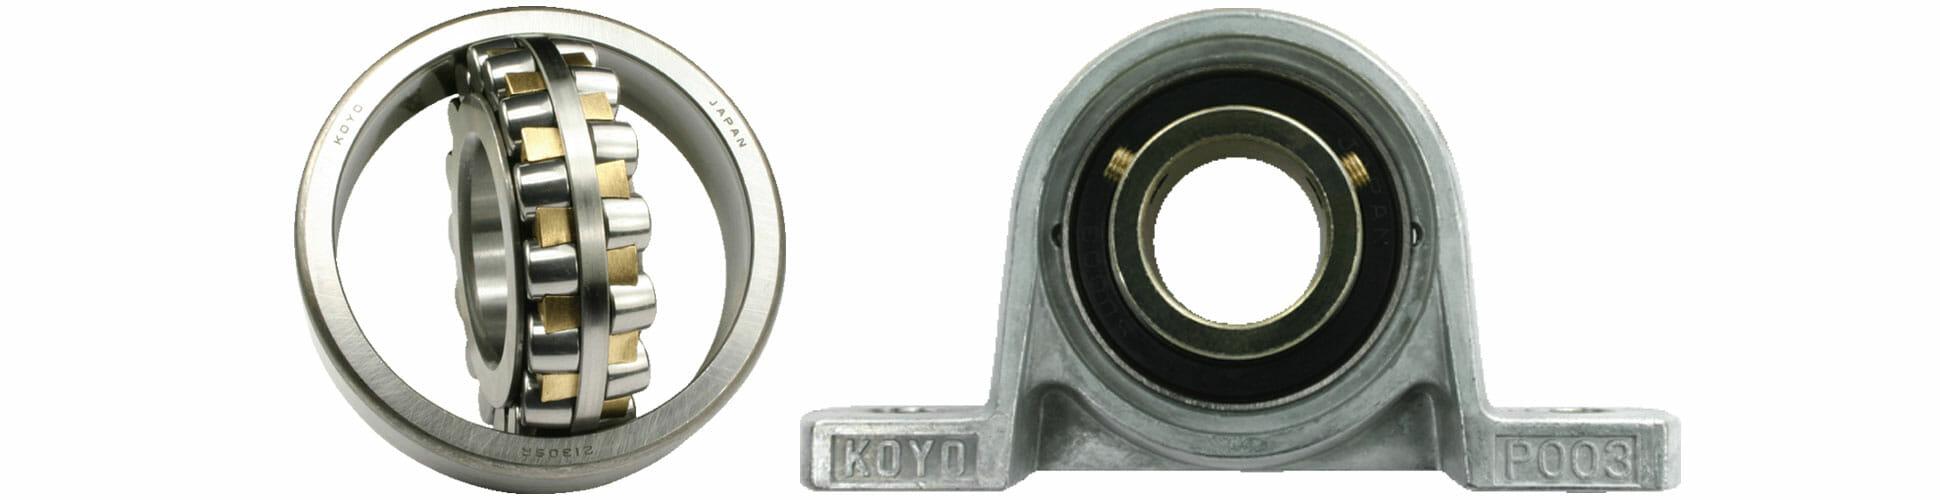 koyo-produkter